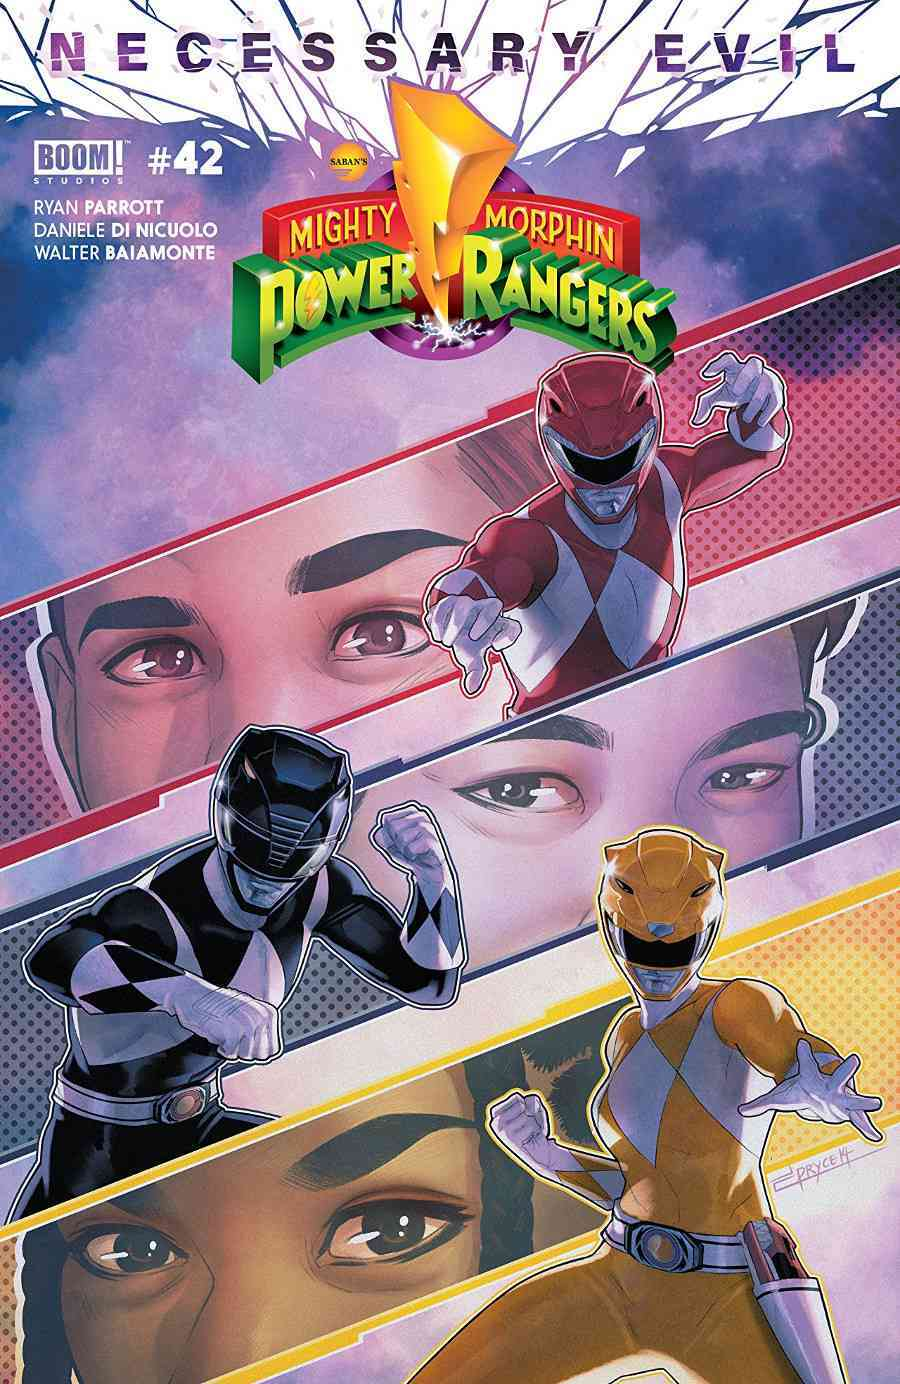 Mighty Morphin Power Rangers #42